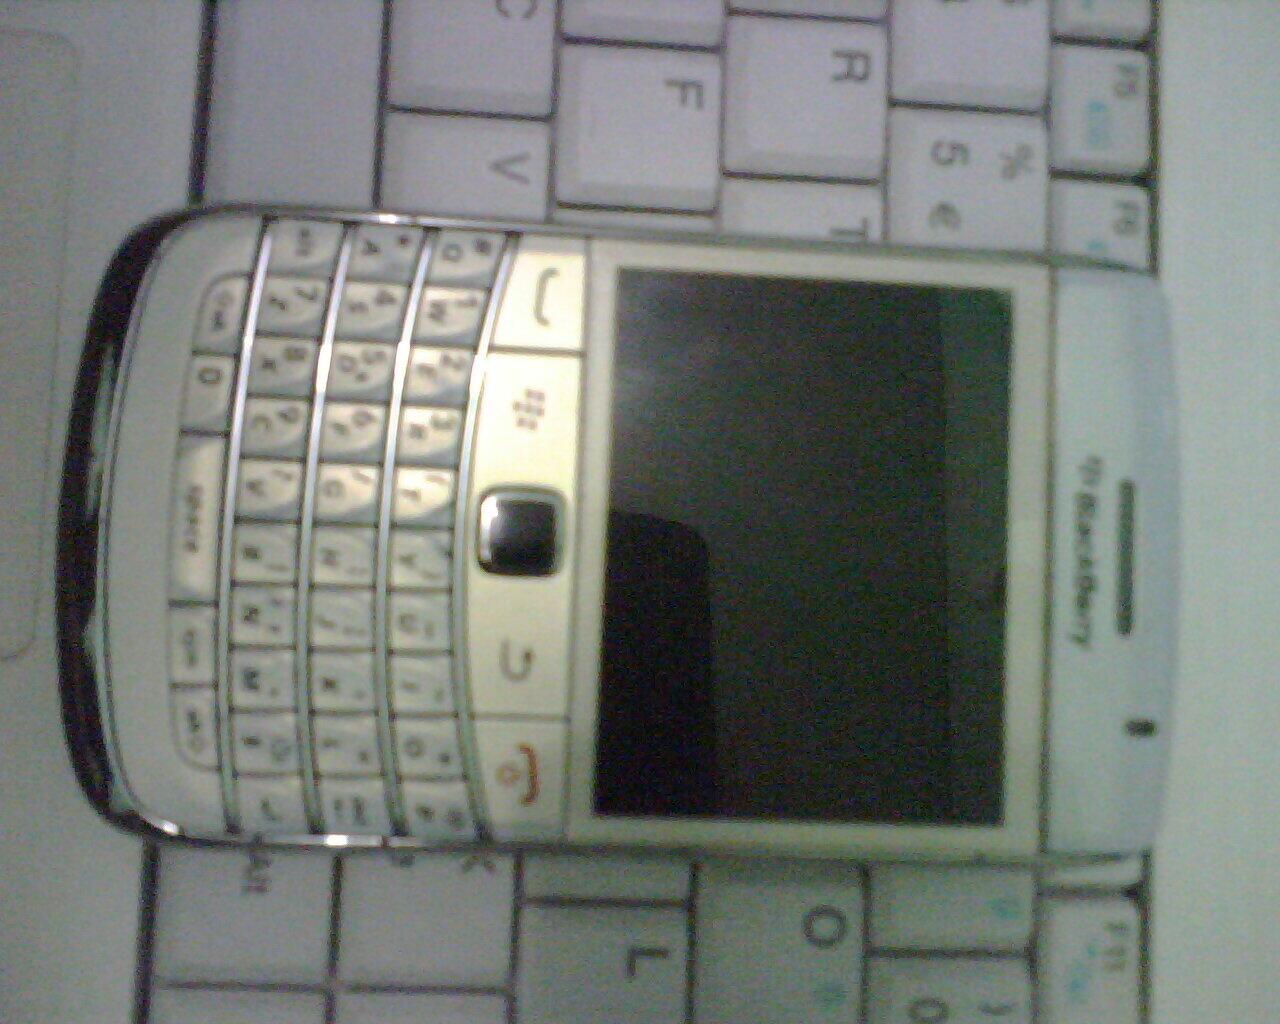 blackberry onyx2 bandung